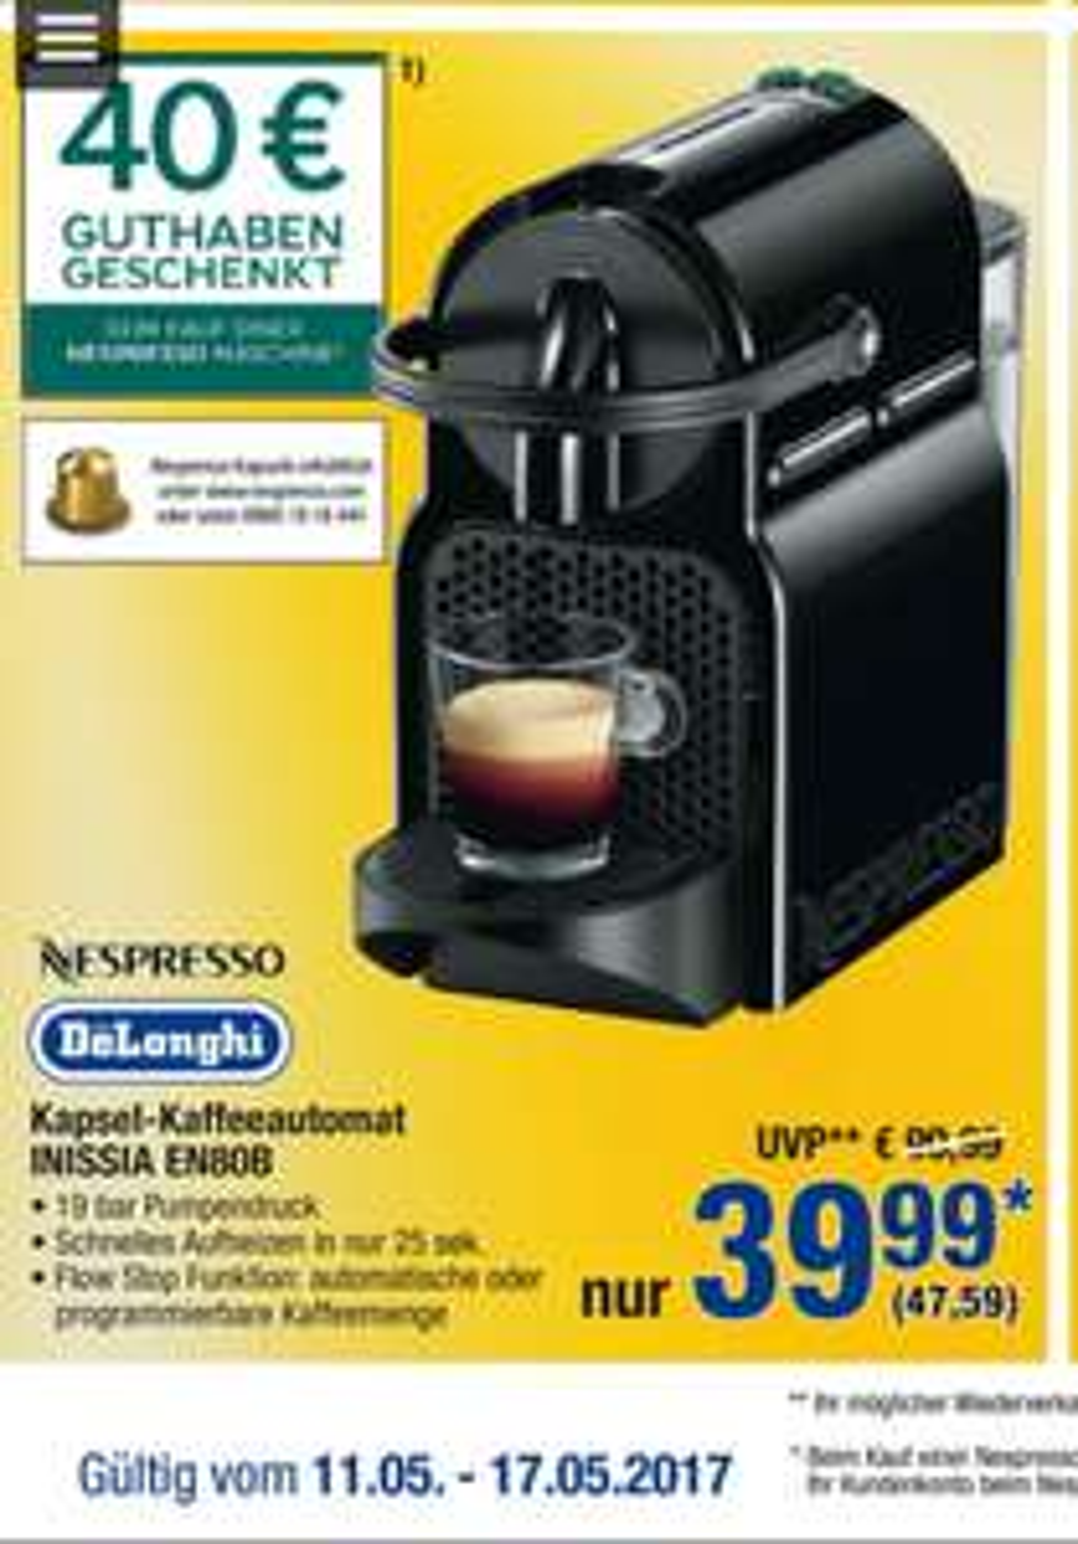 [offline] DeLonghi Inissia EN80B Nespresso inkl. 40€ Guthaben @Metro